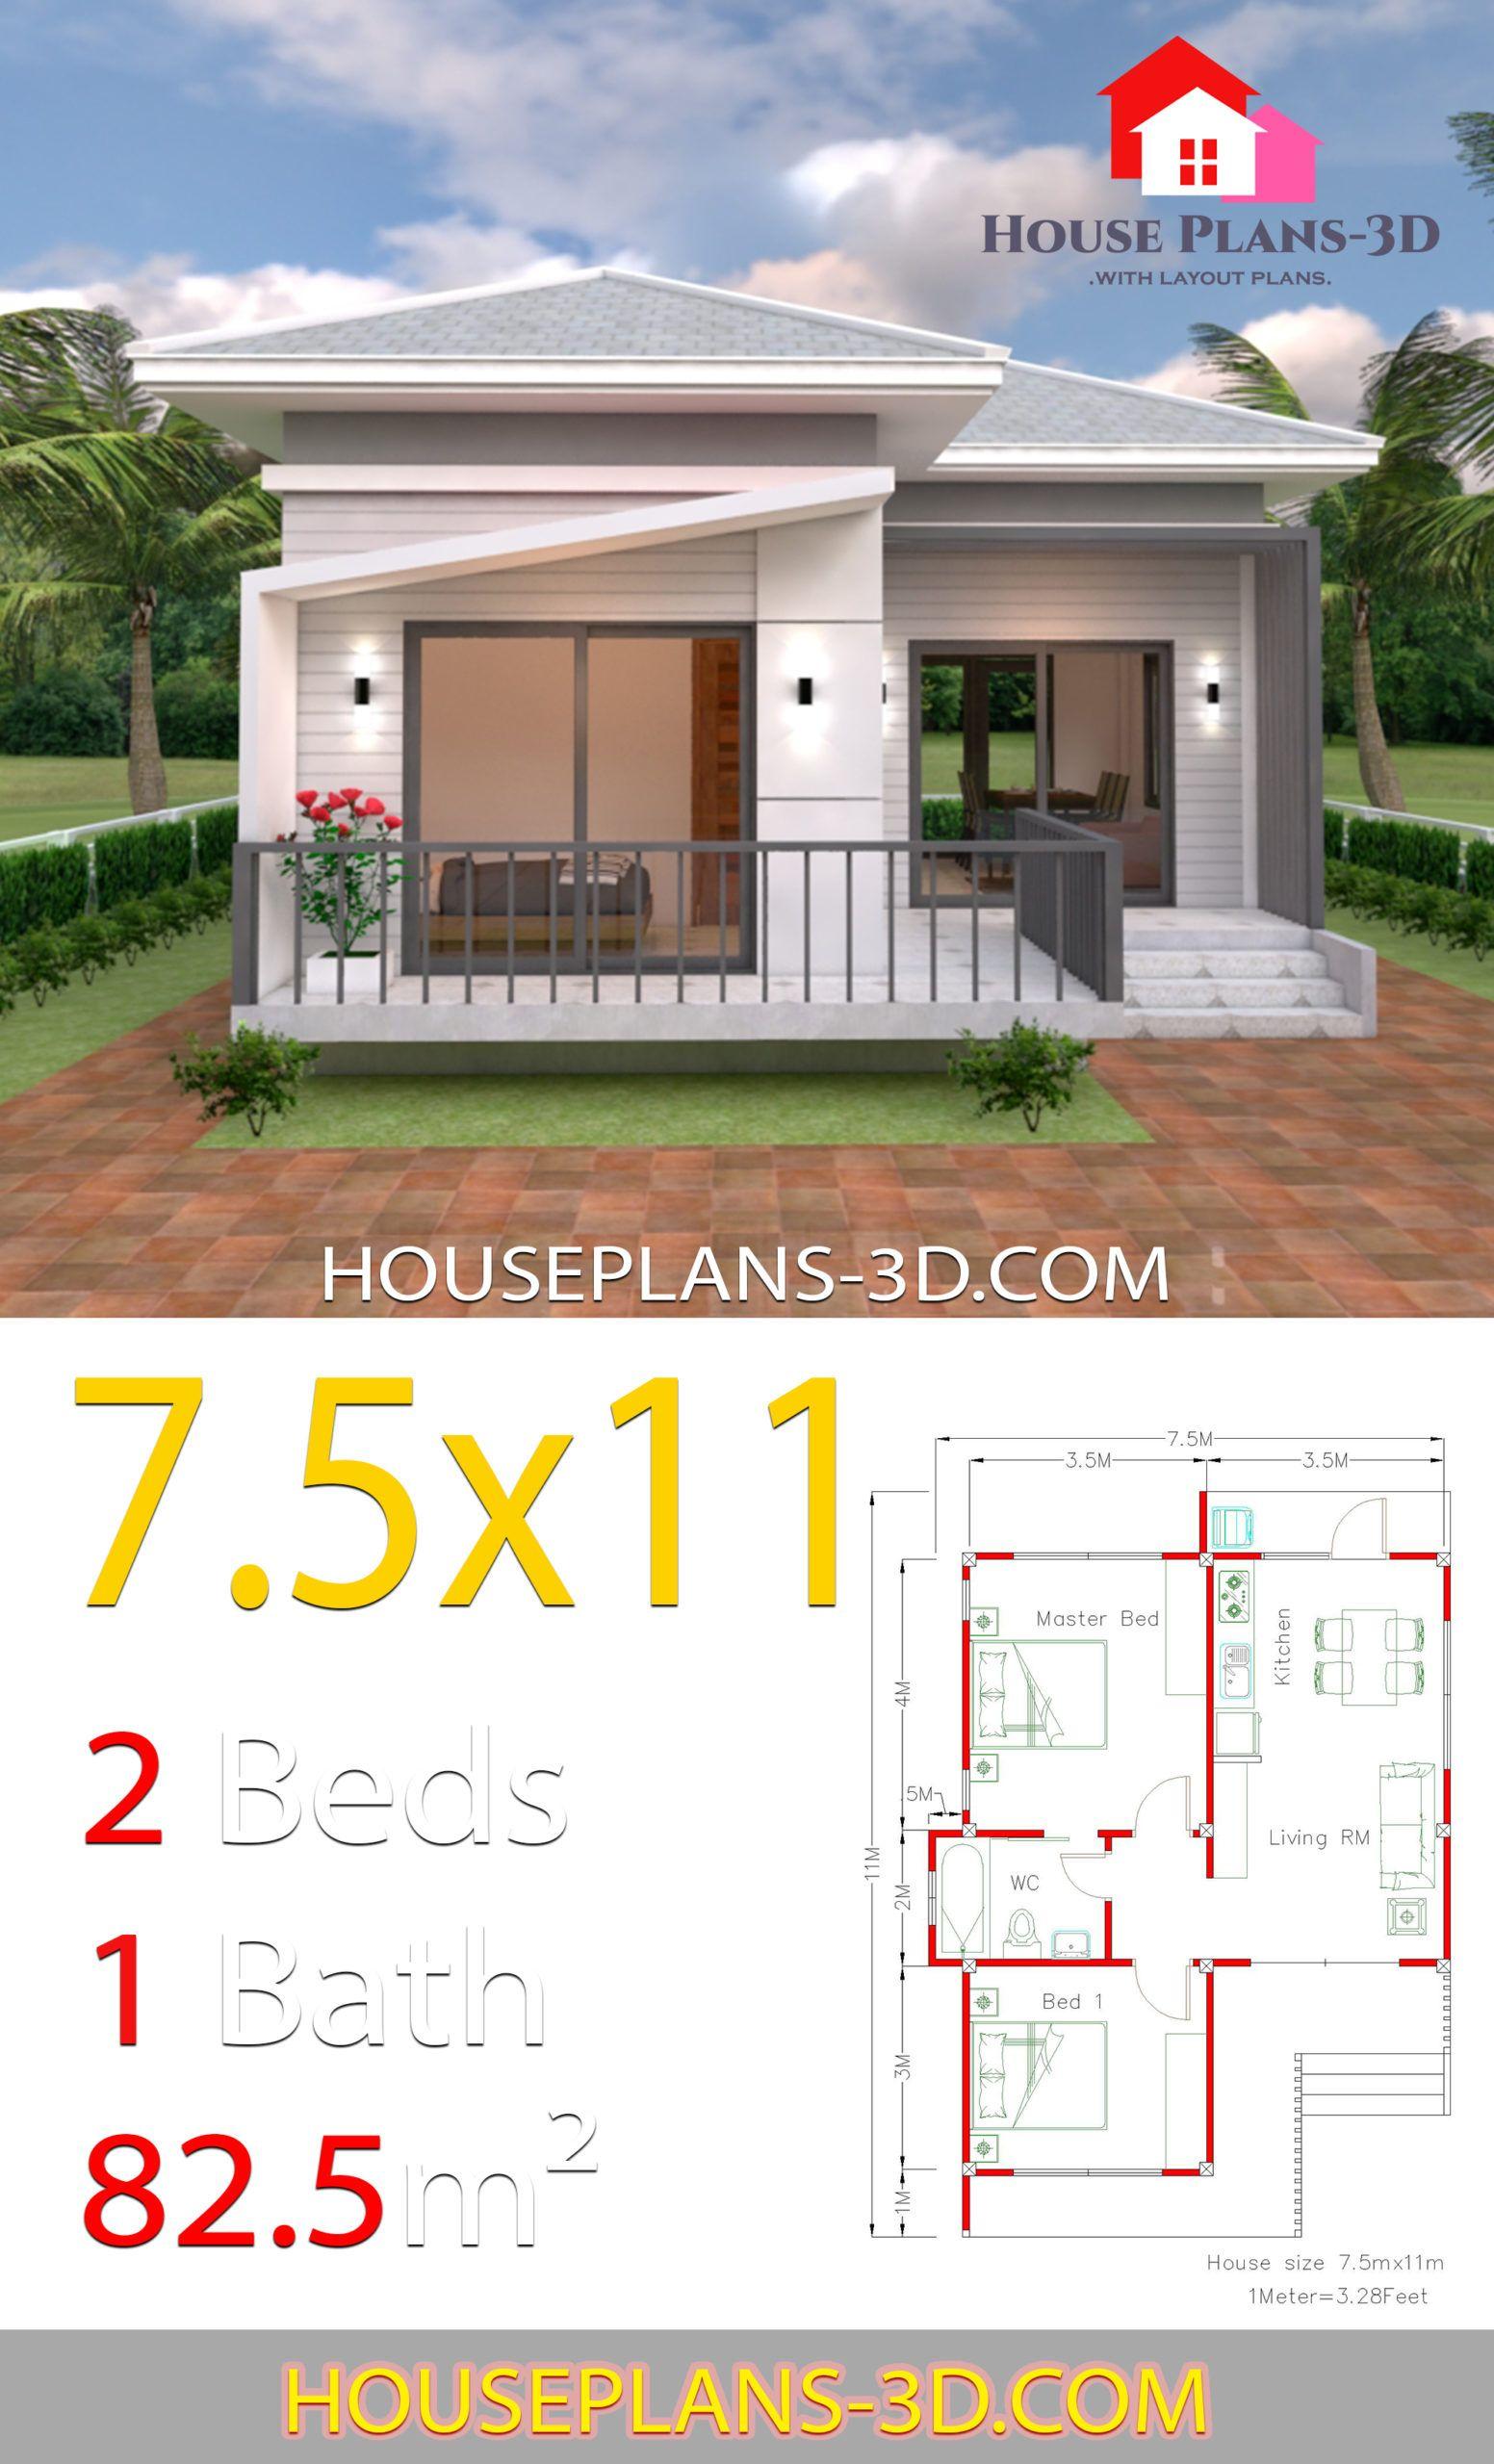 41+ Hip roof house designs ideas